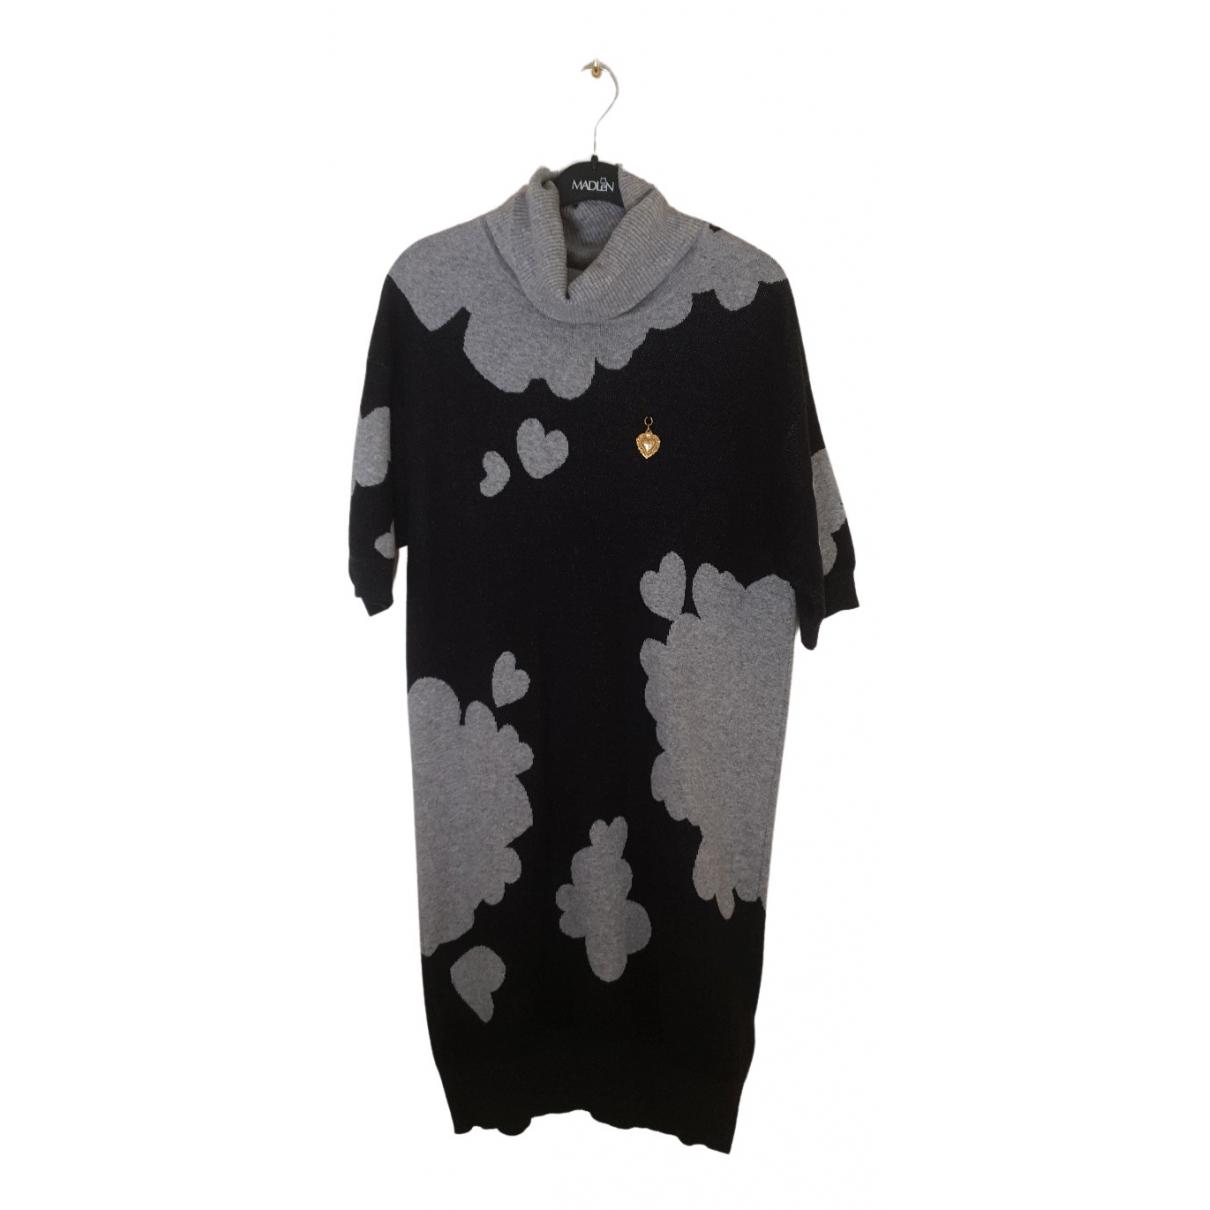 Moschino Love N Grey Wool dress for Women 8 US